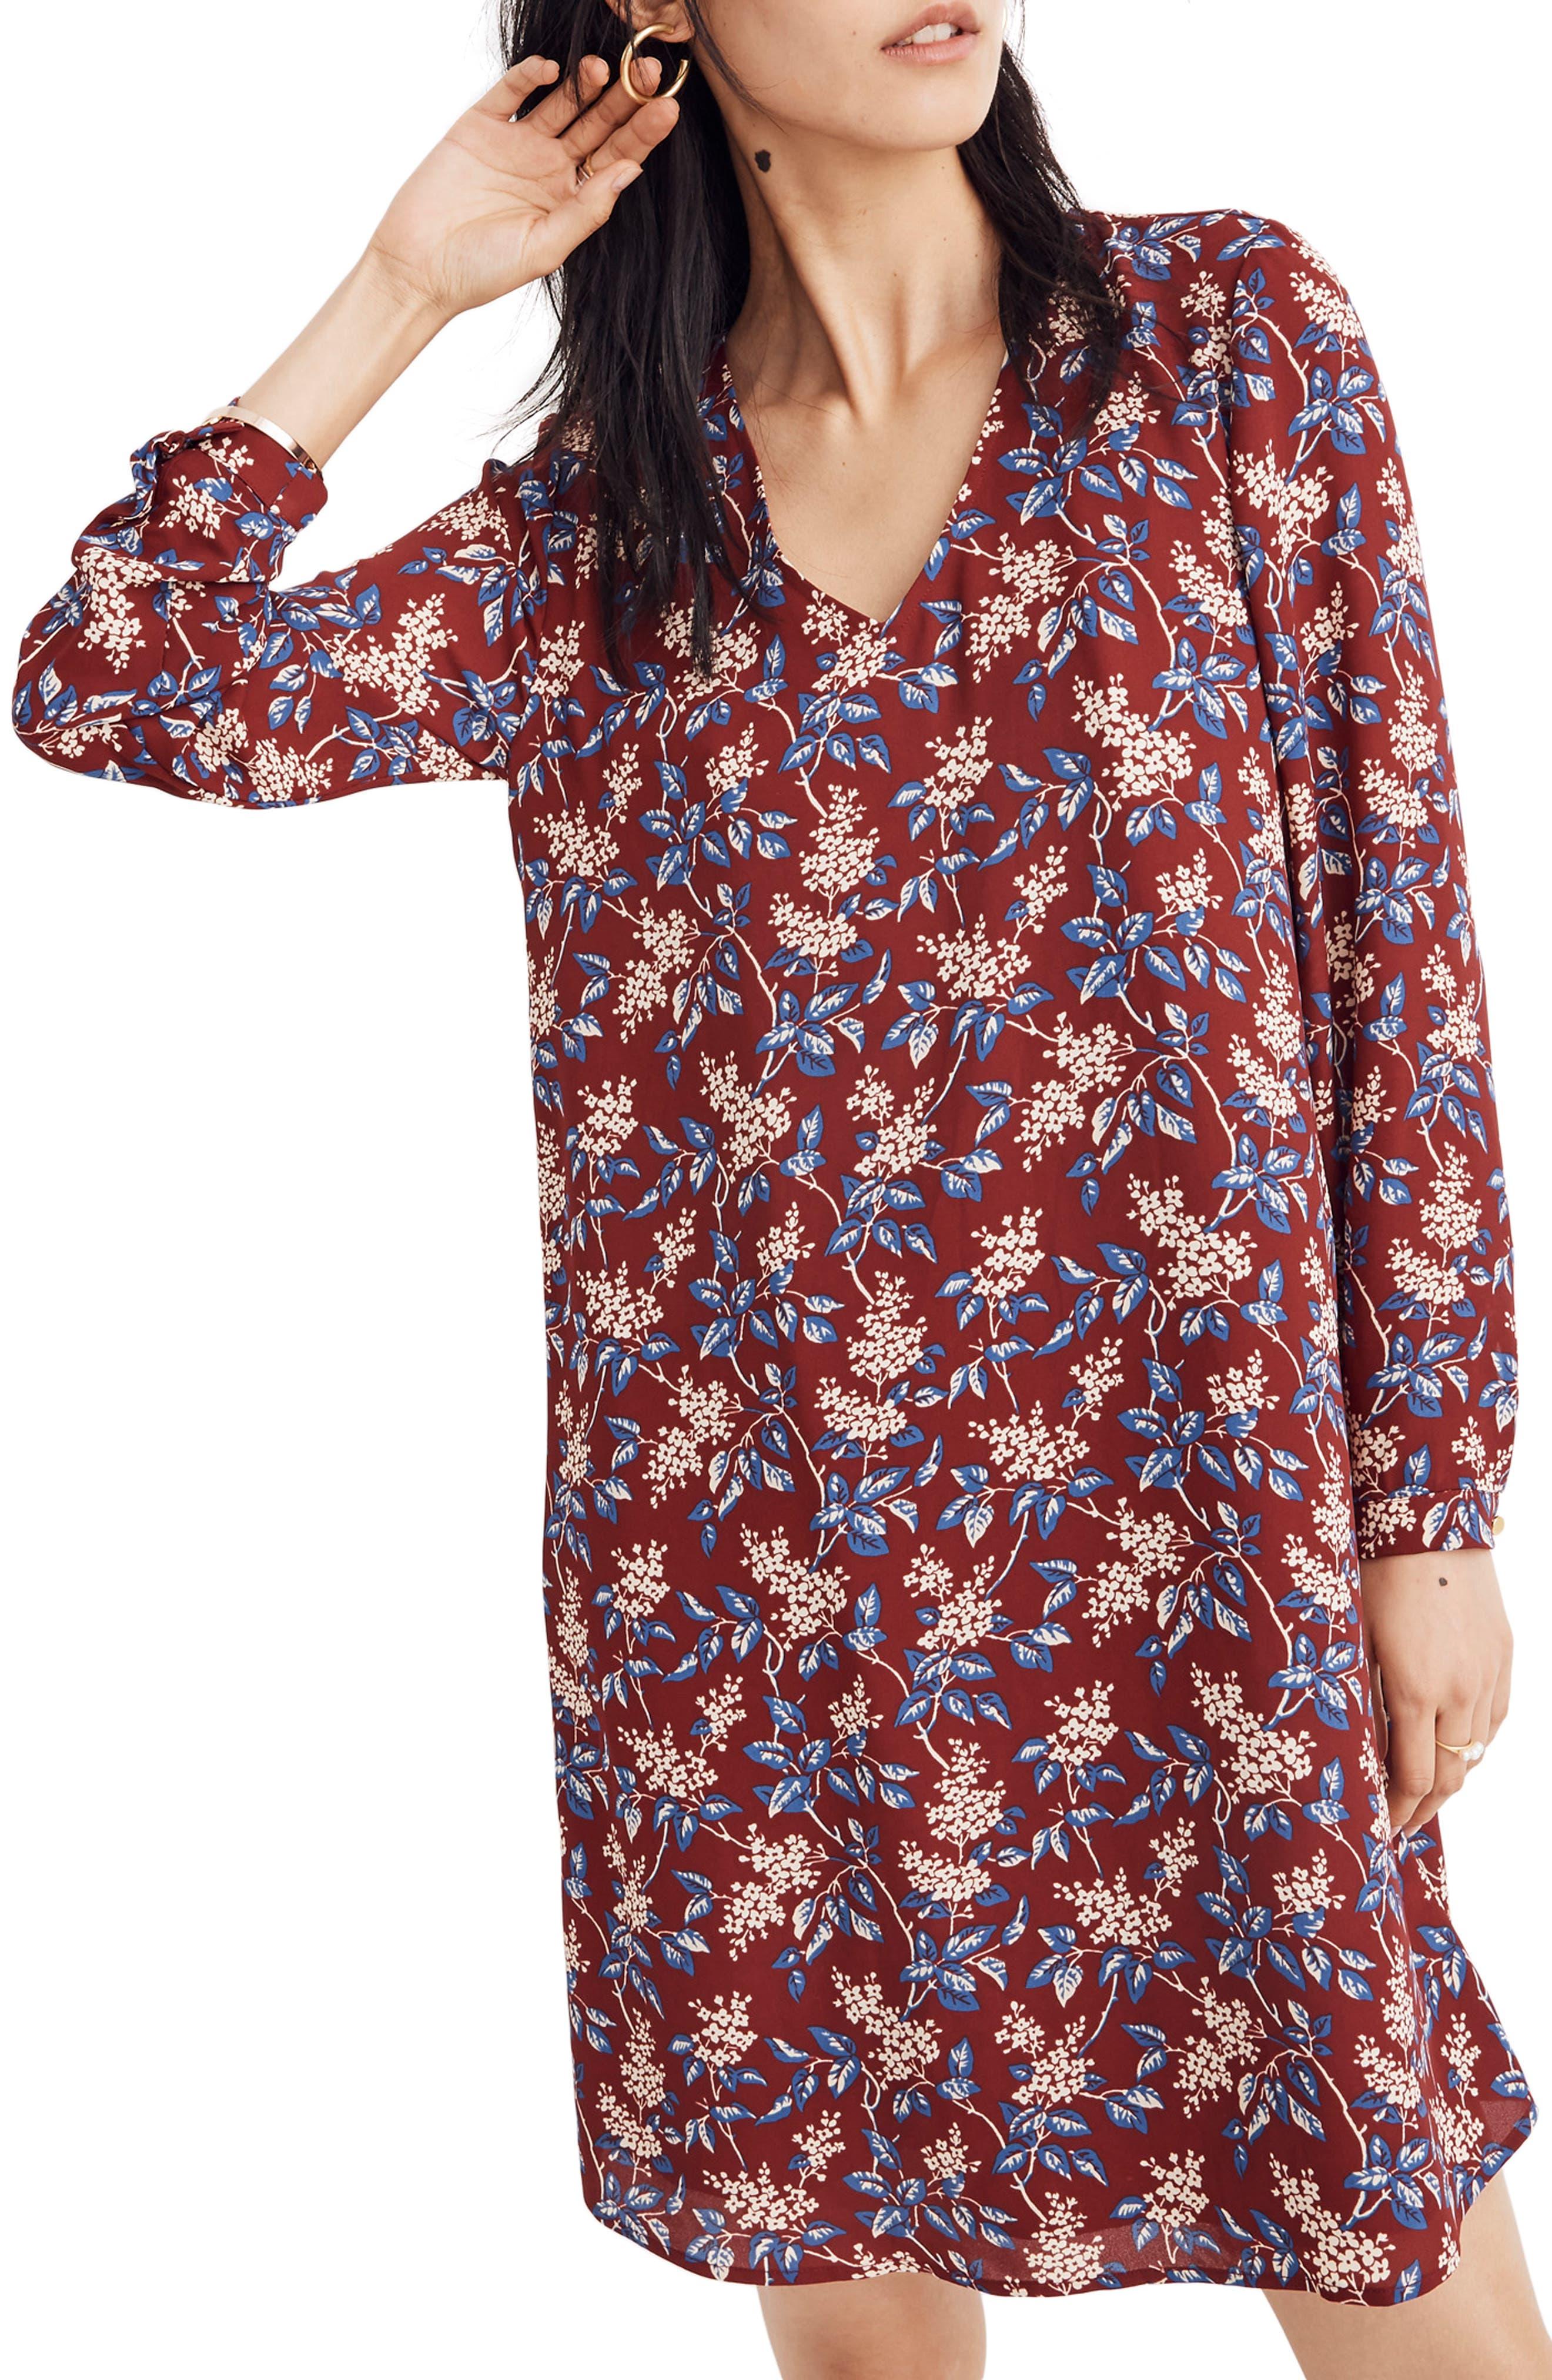 Madewell Antique Flora Button Back Dress, Red